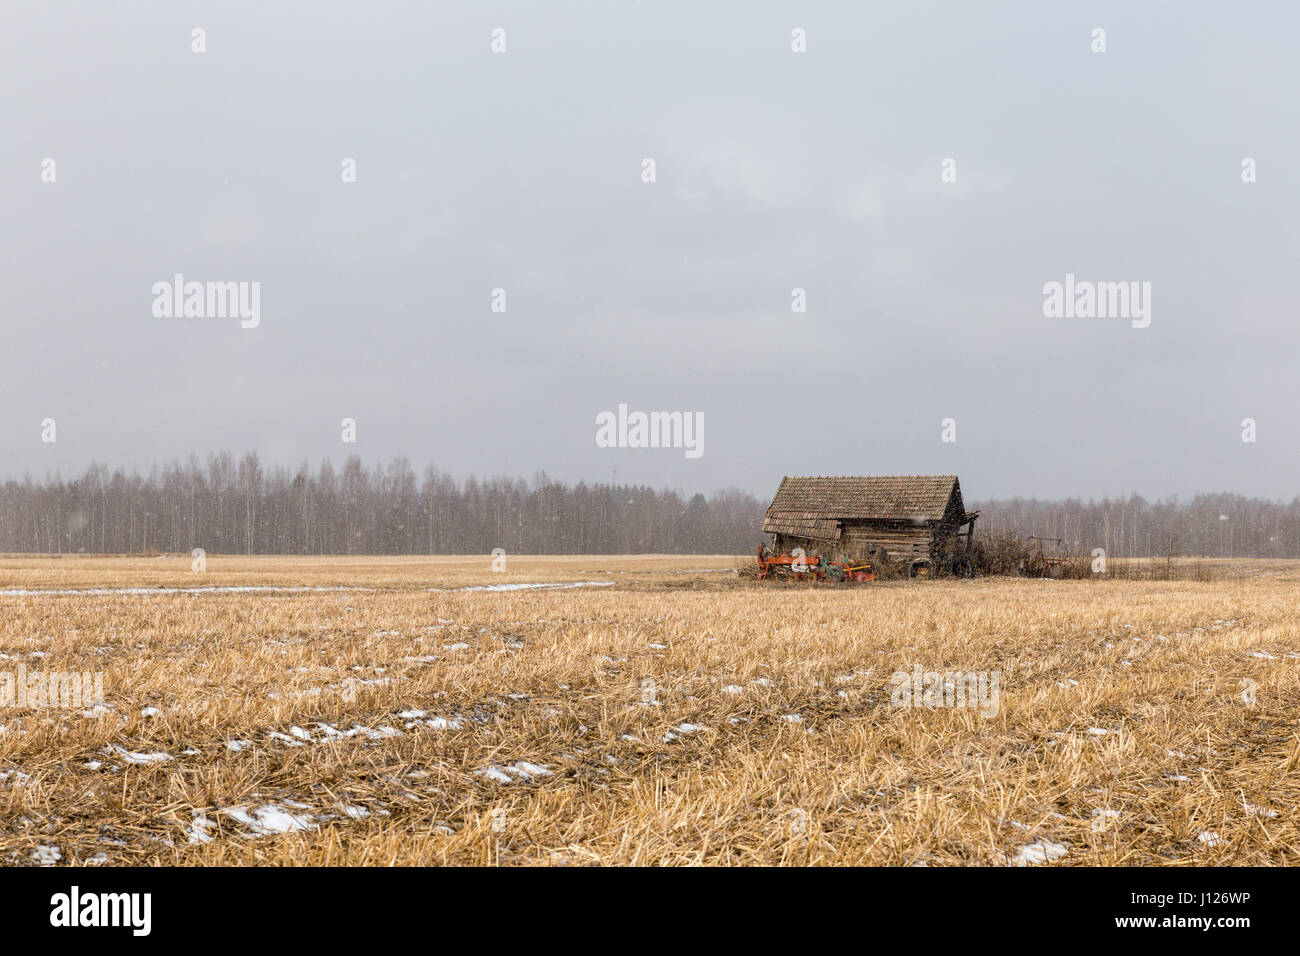 Snowing - Stock Image